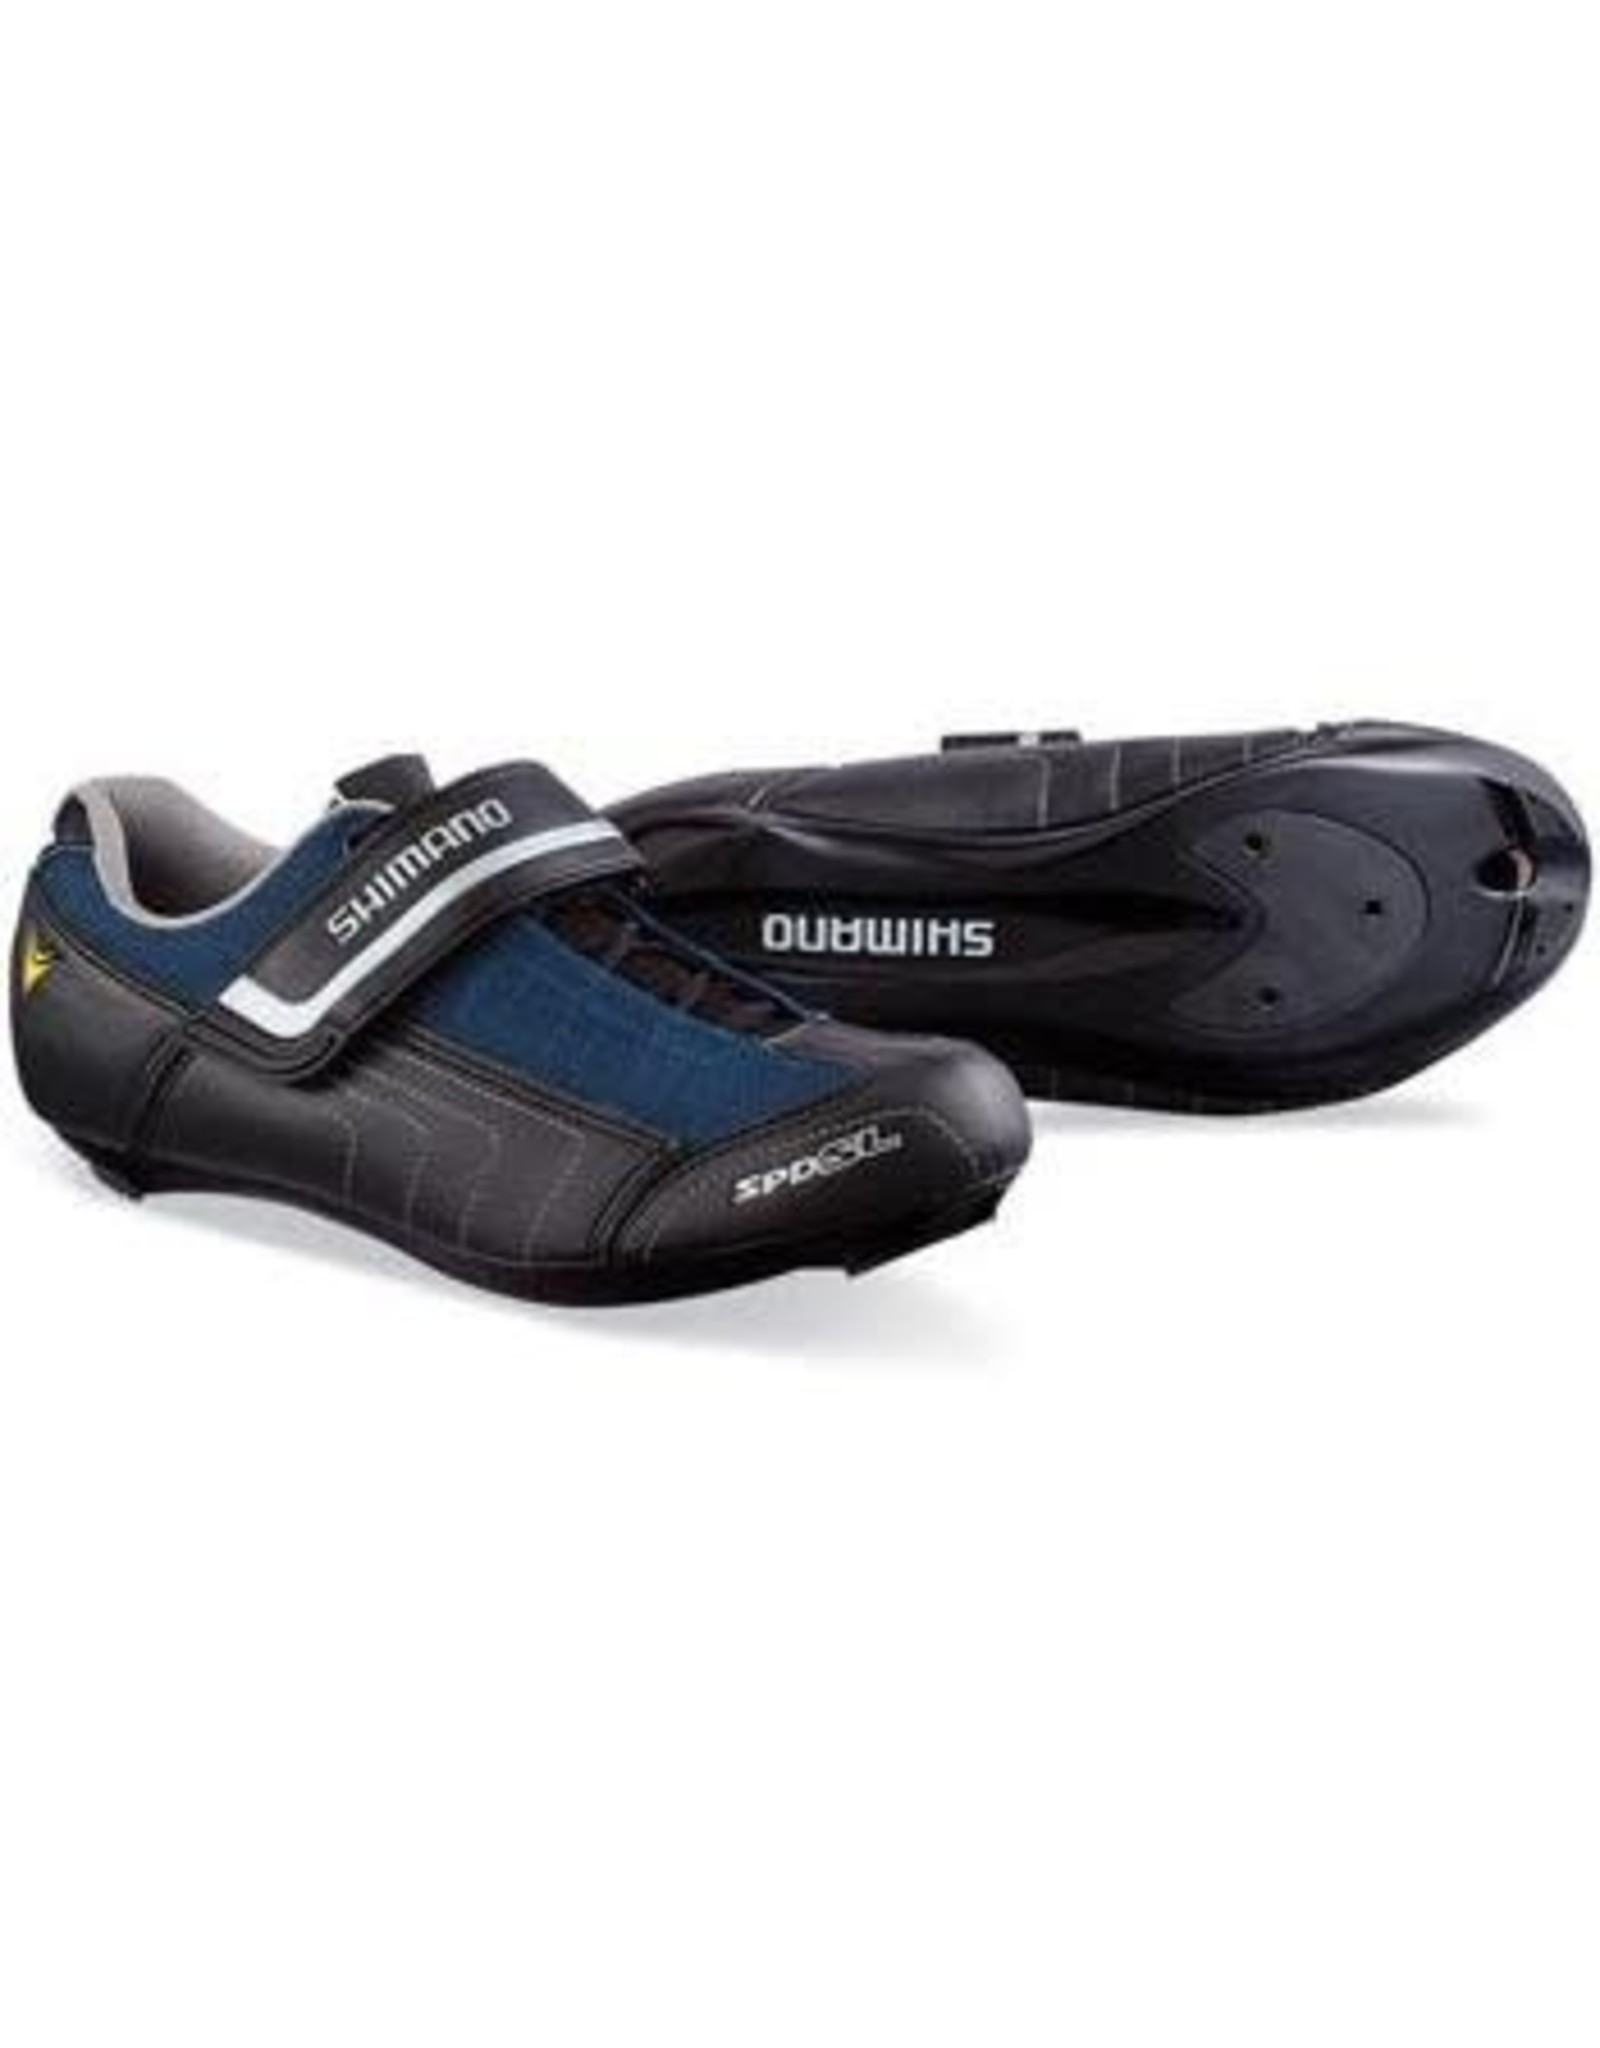 Shimano RO61 Road Shoe 40